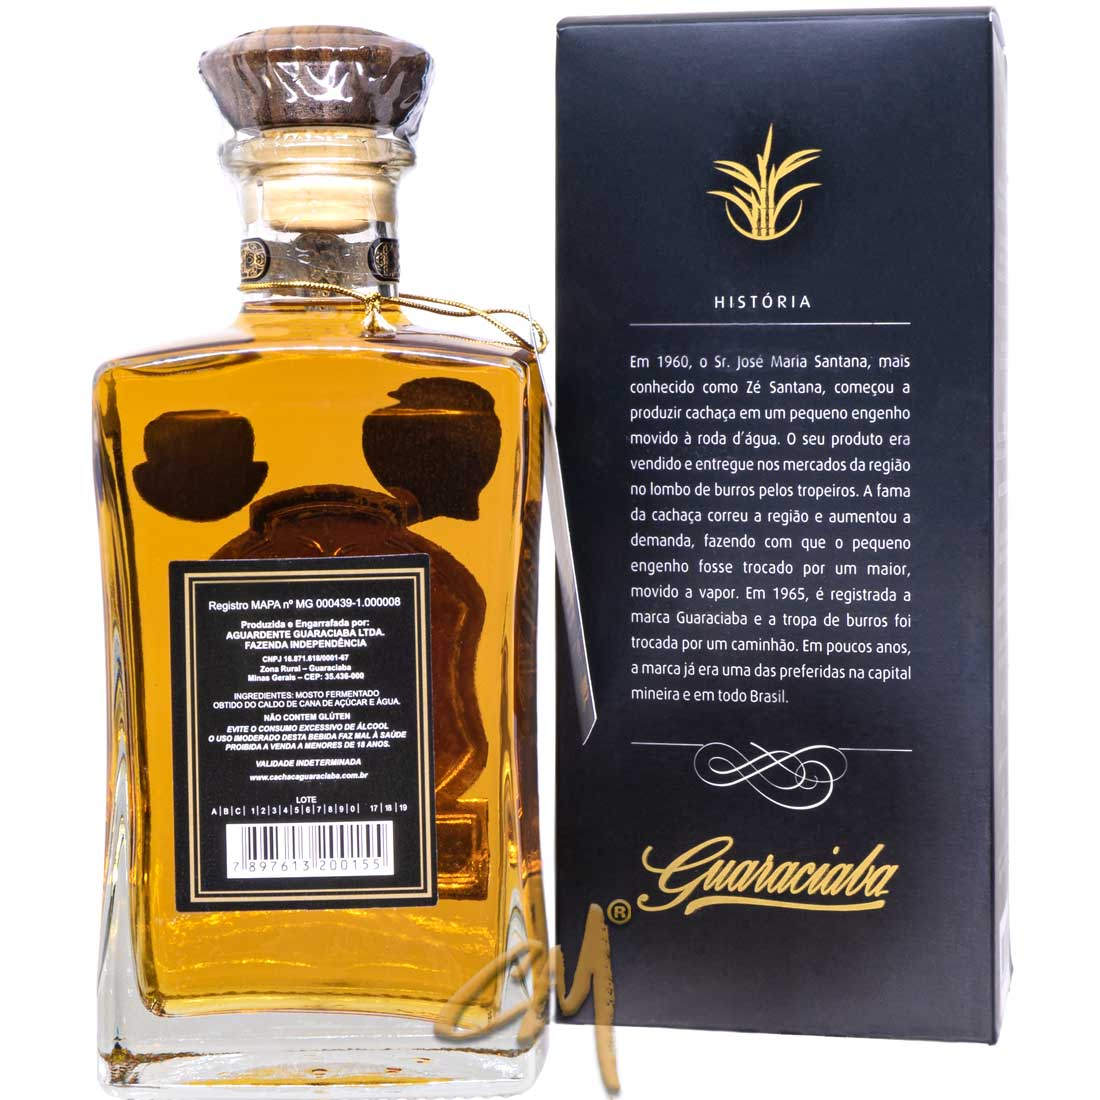 Cachaça Guaraciaba Extra Premium 750 ml (Guaraciaba - MG)